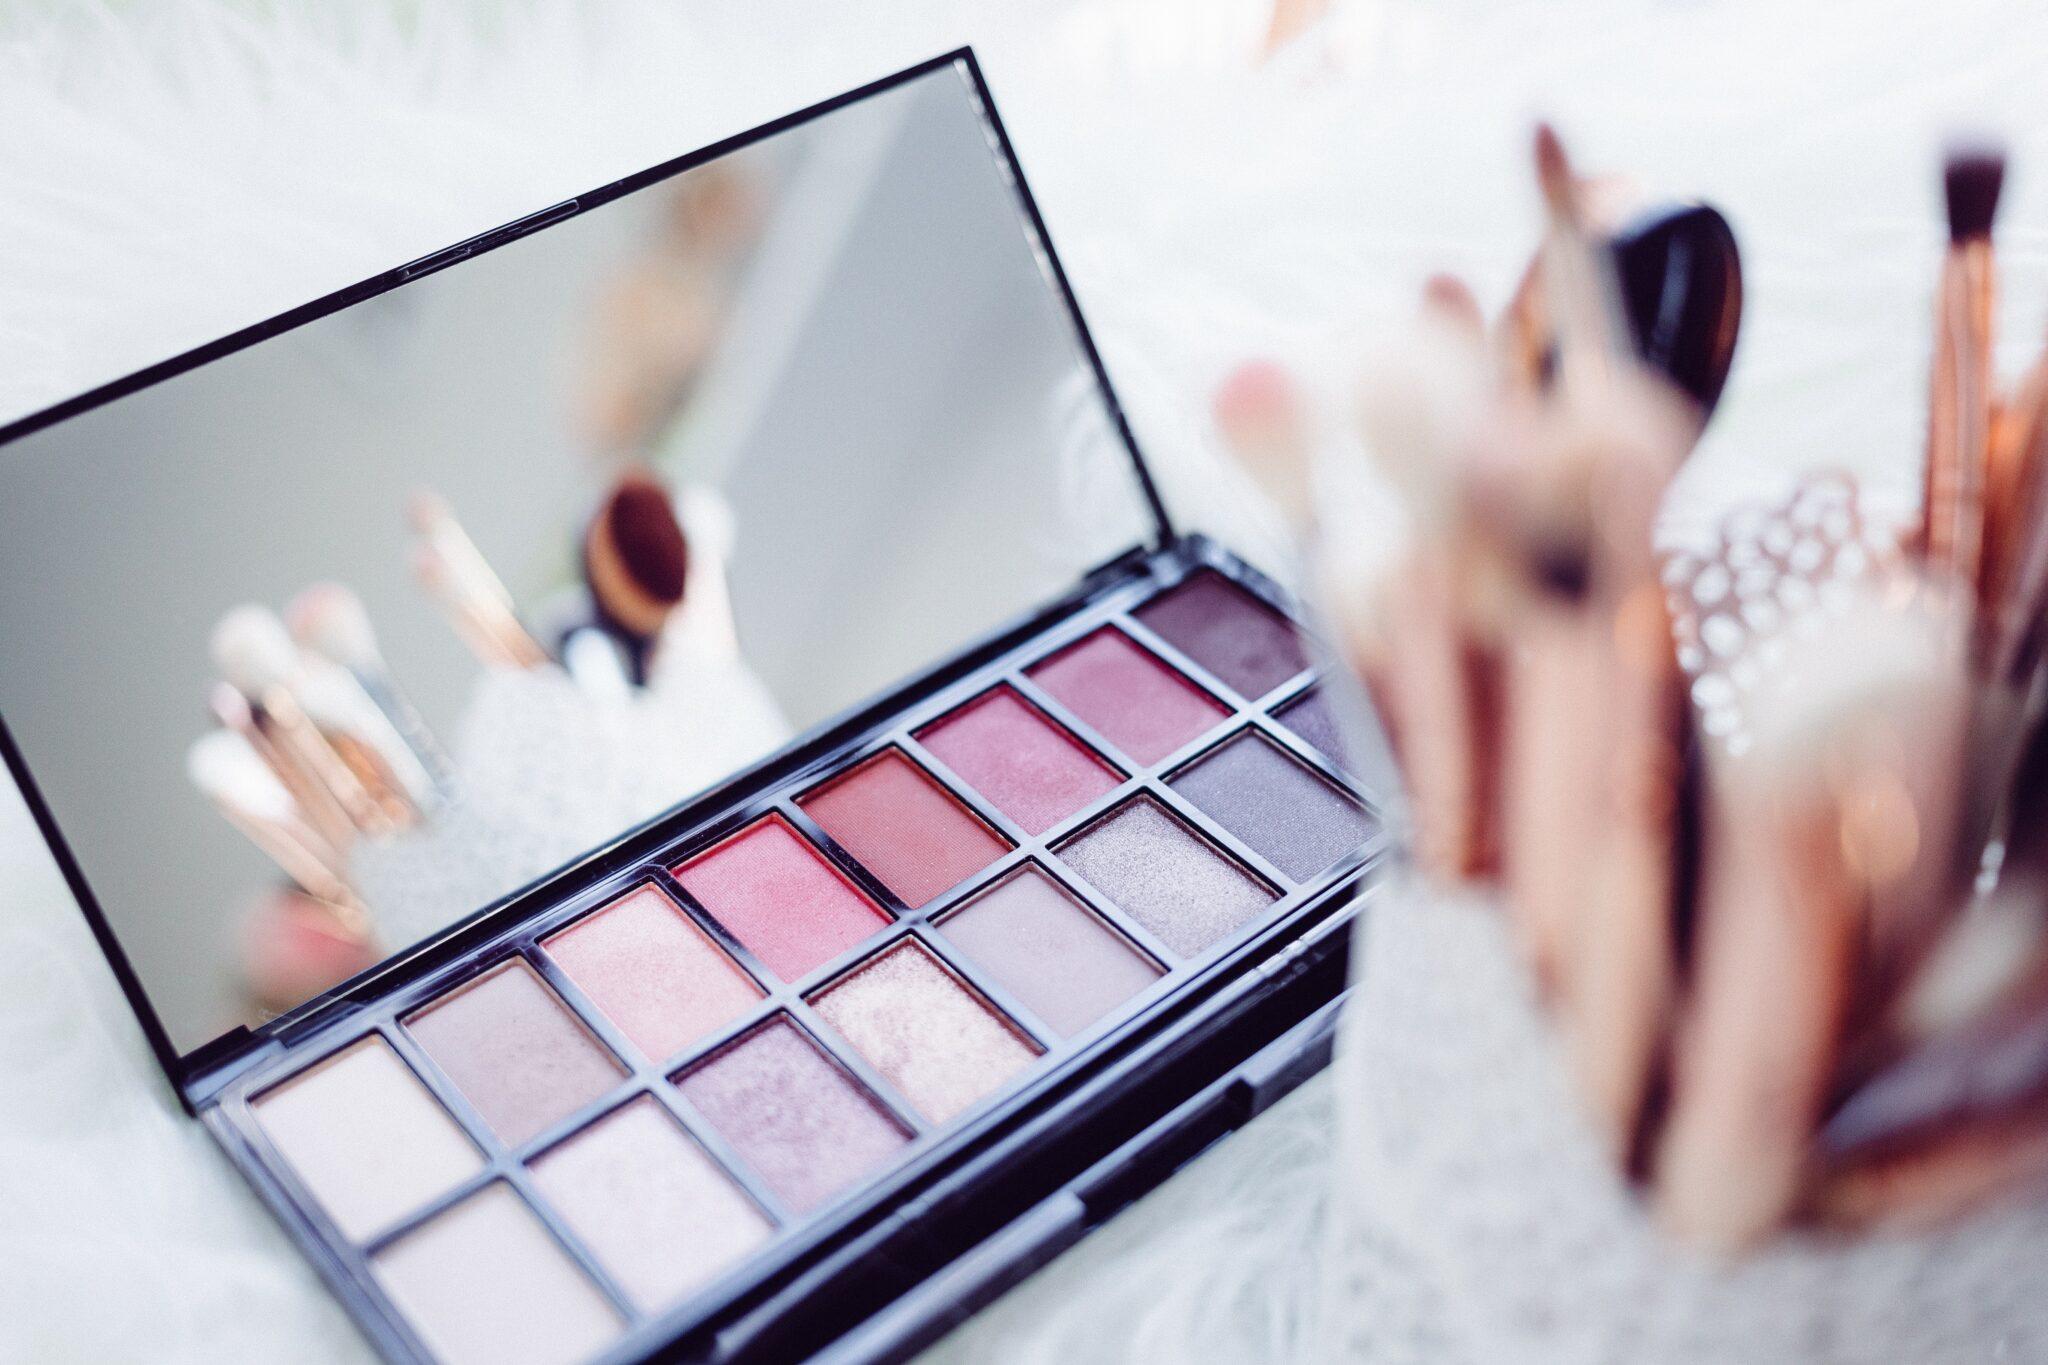 6 beauty hacks for perfect skin | Skin regime | Beauty tips | Elle Blonde Luxury Lifestyle Destination Blog